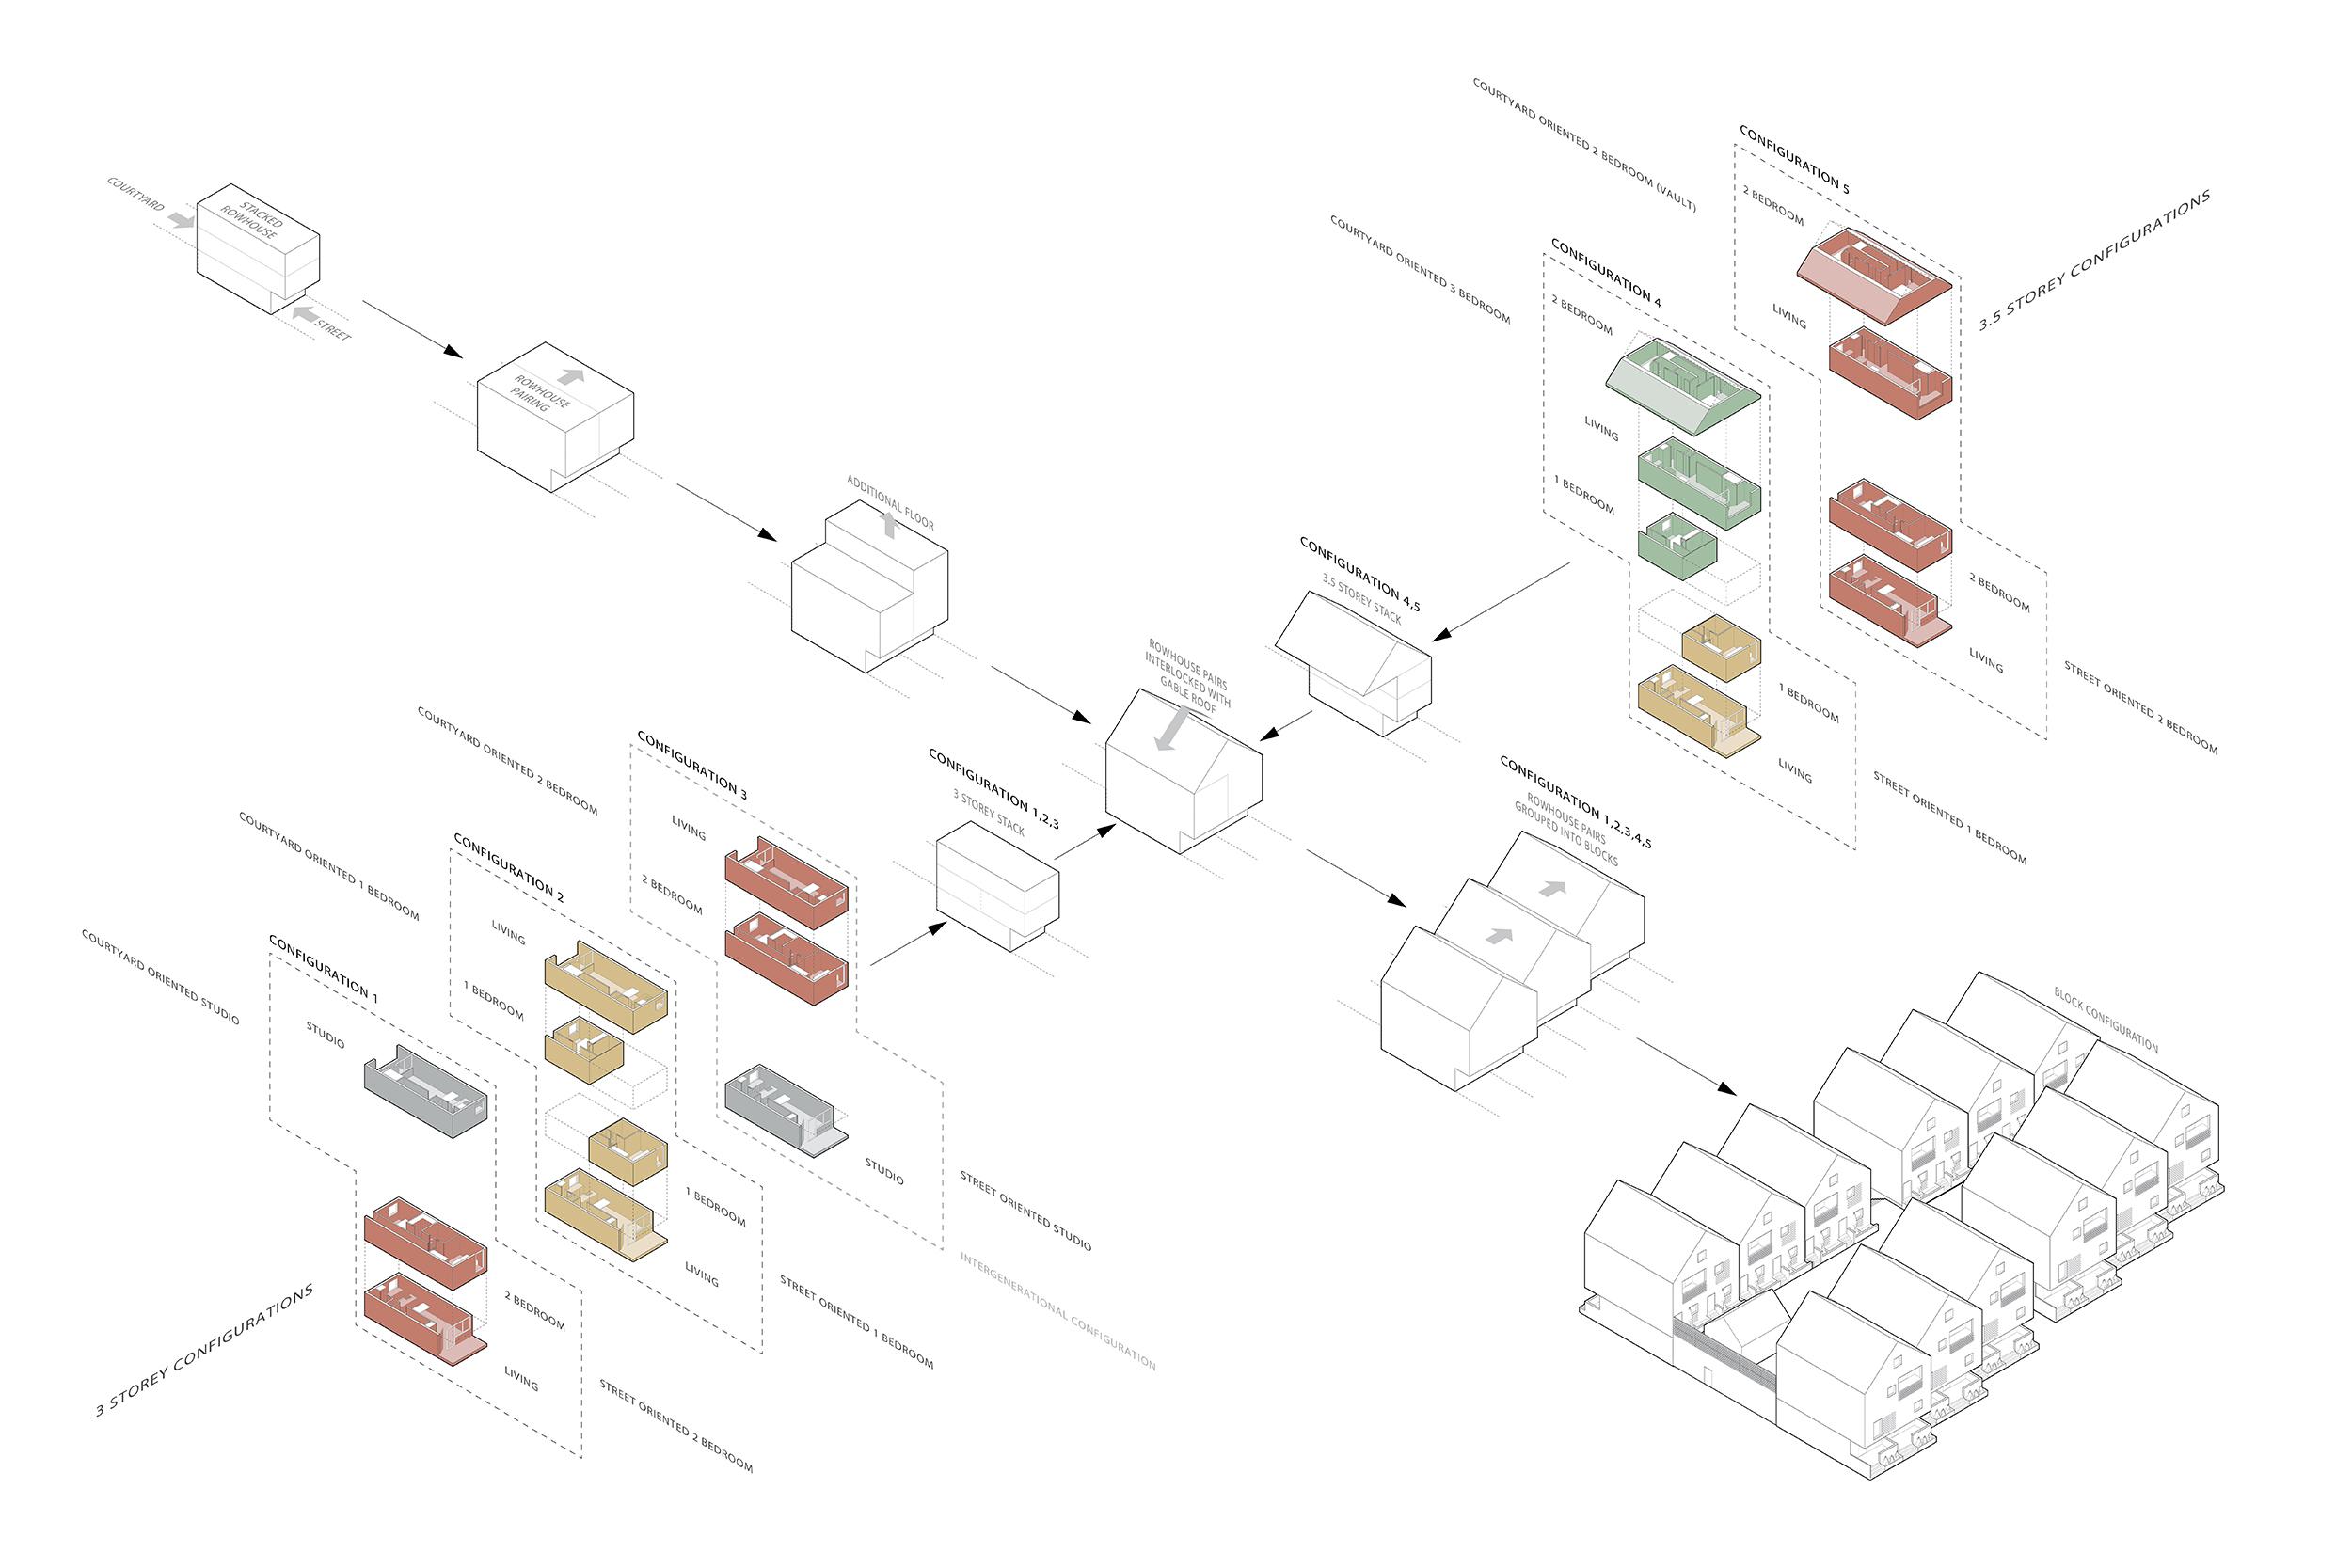 Bricolage | Leckie Studio Architecture + Design